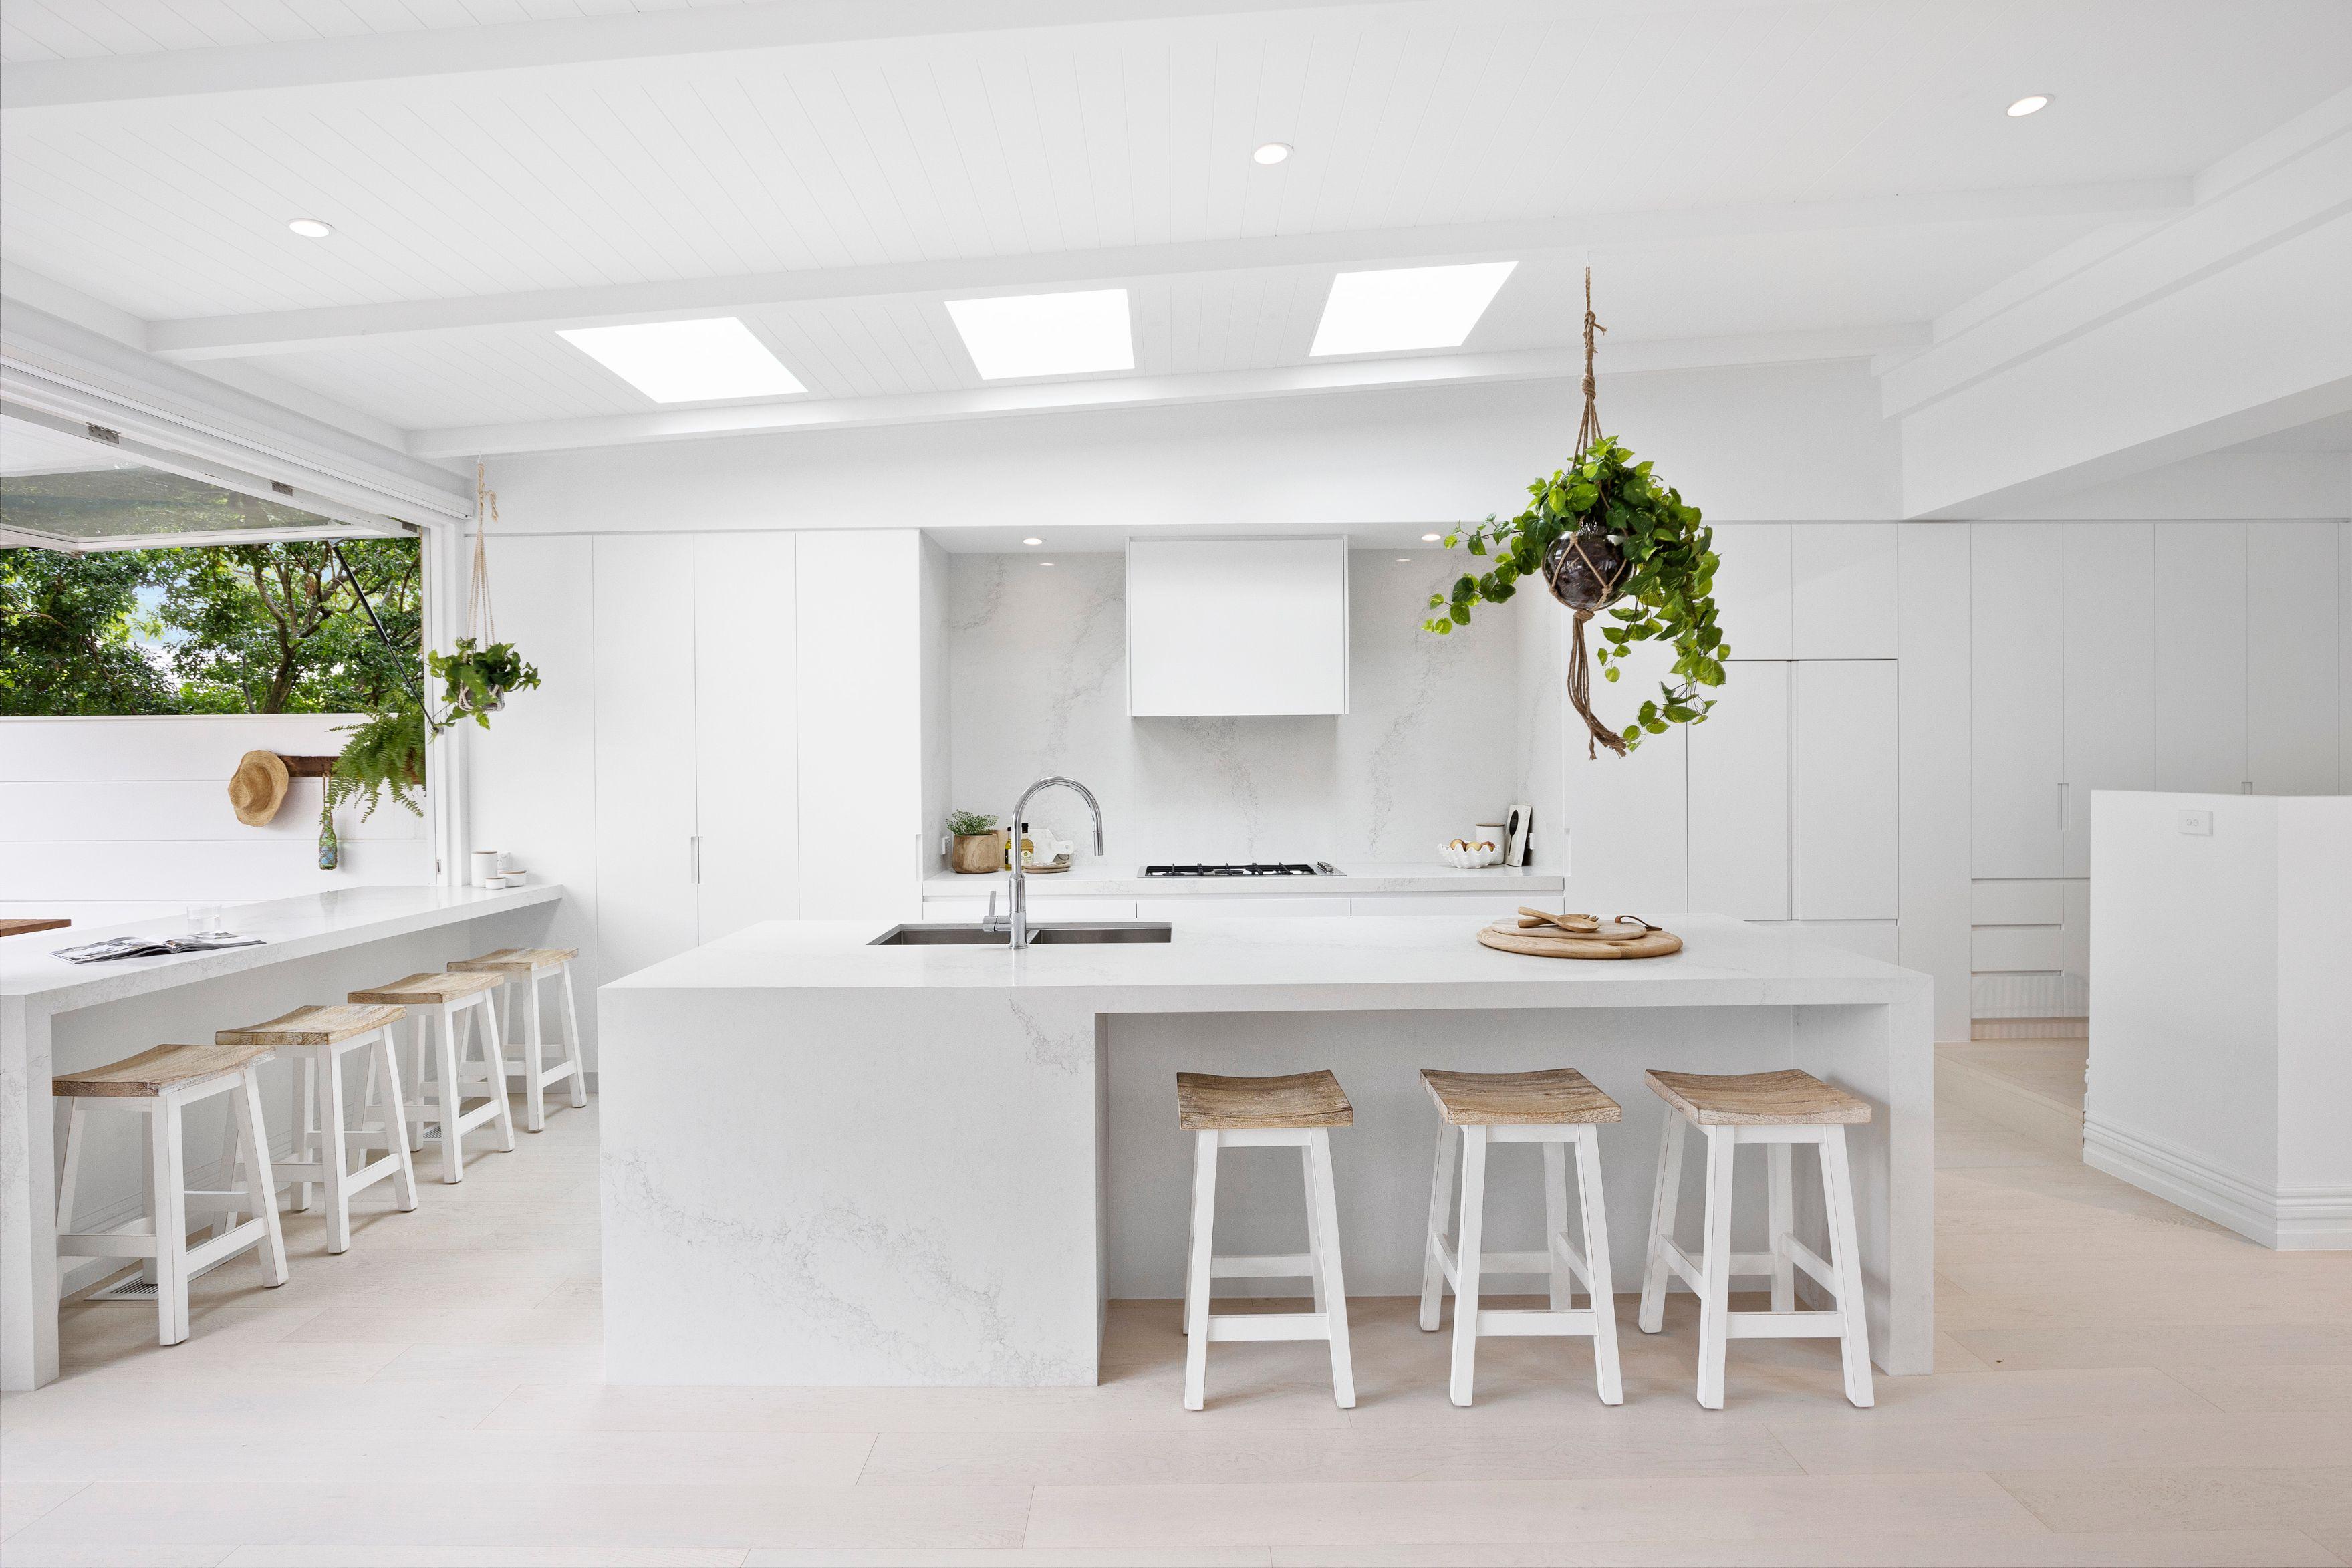 House 6 - Kitchen